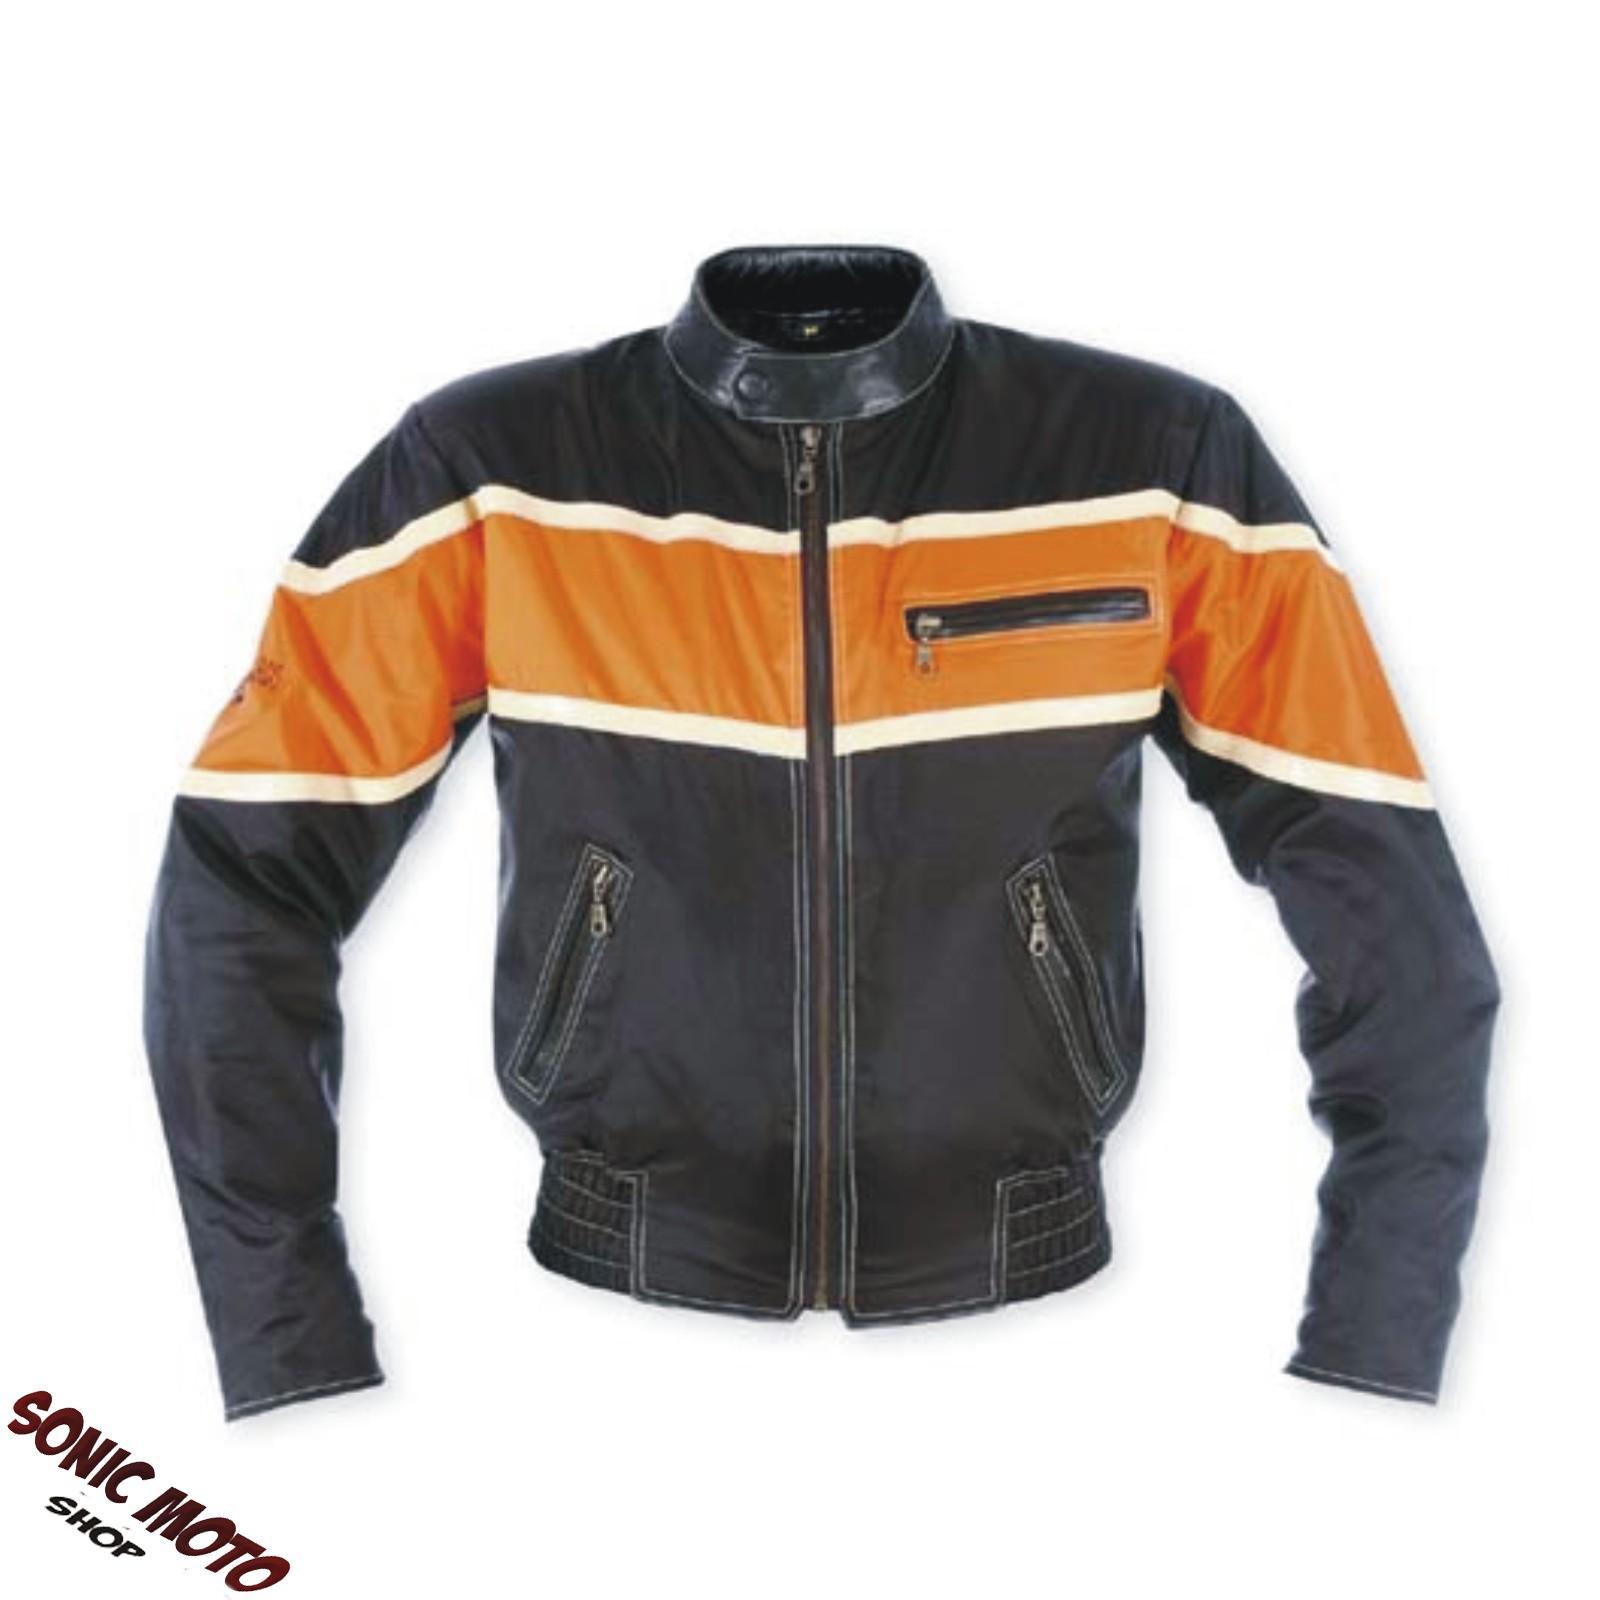 Giacca-Moto-Tessuto-Interno-termico-Custom-Chopper-Naked-Oxford-Nylon